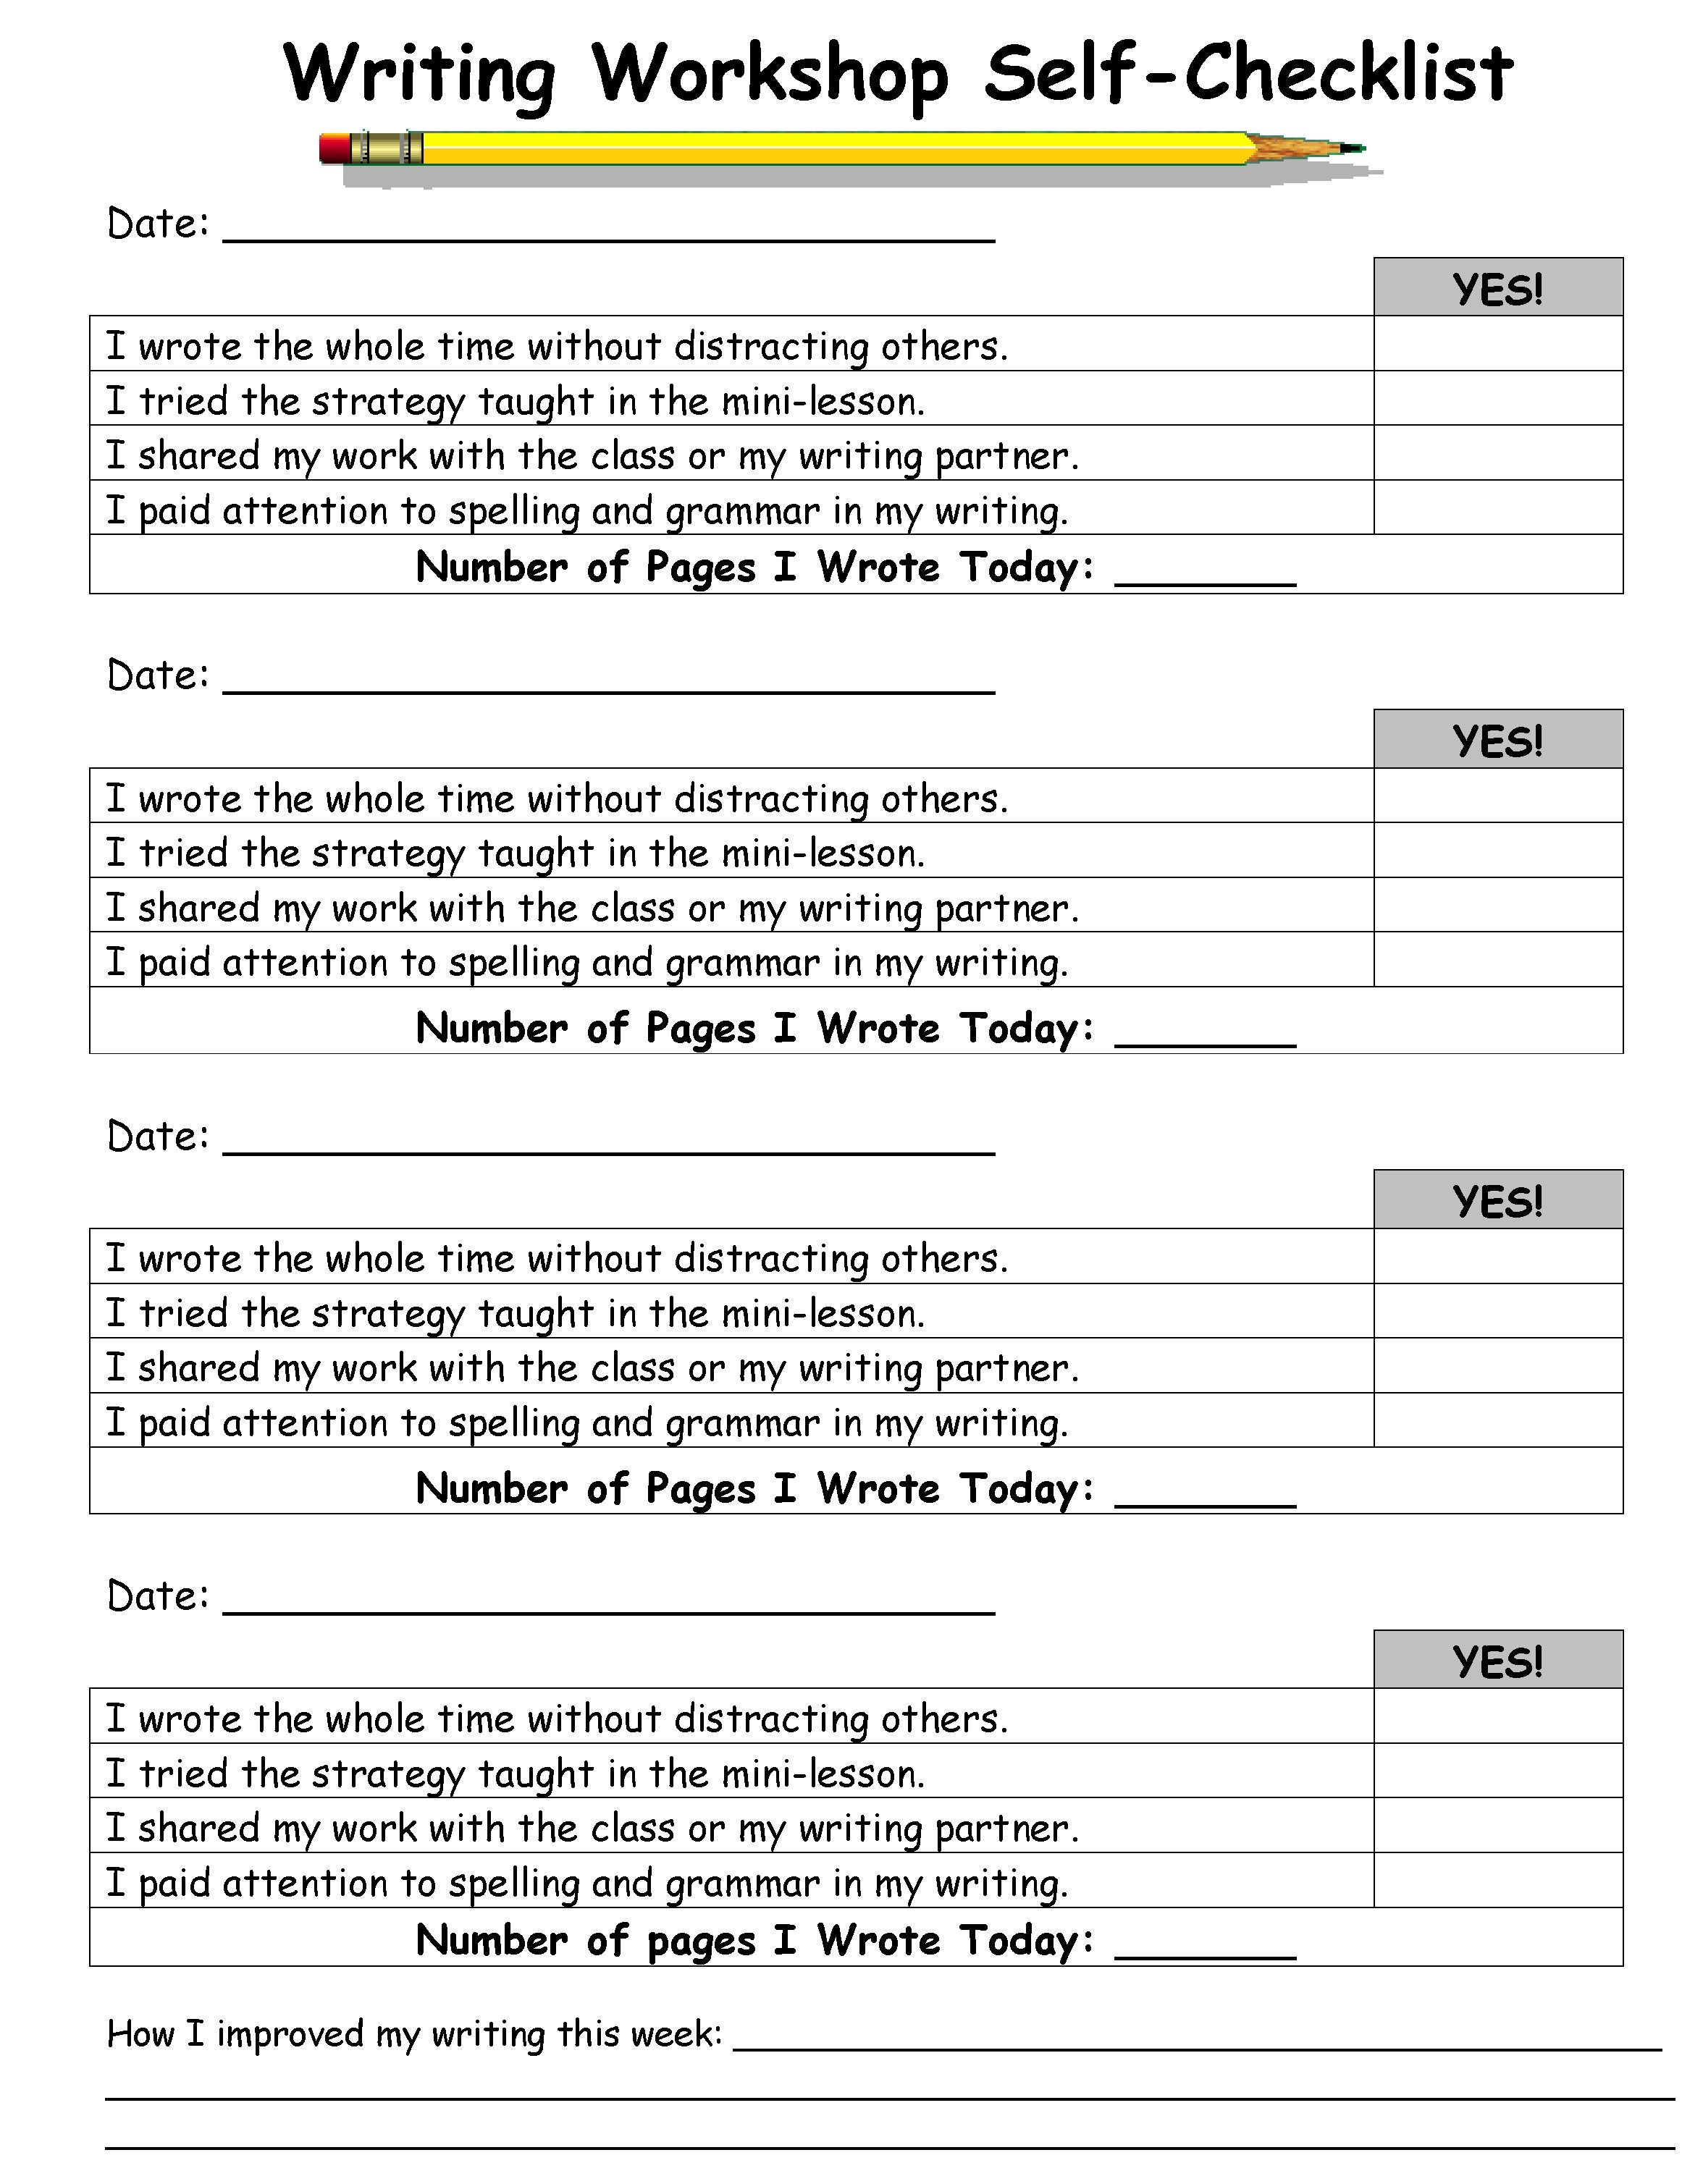 peer editing checklist essay writing